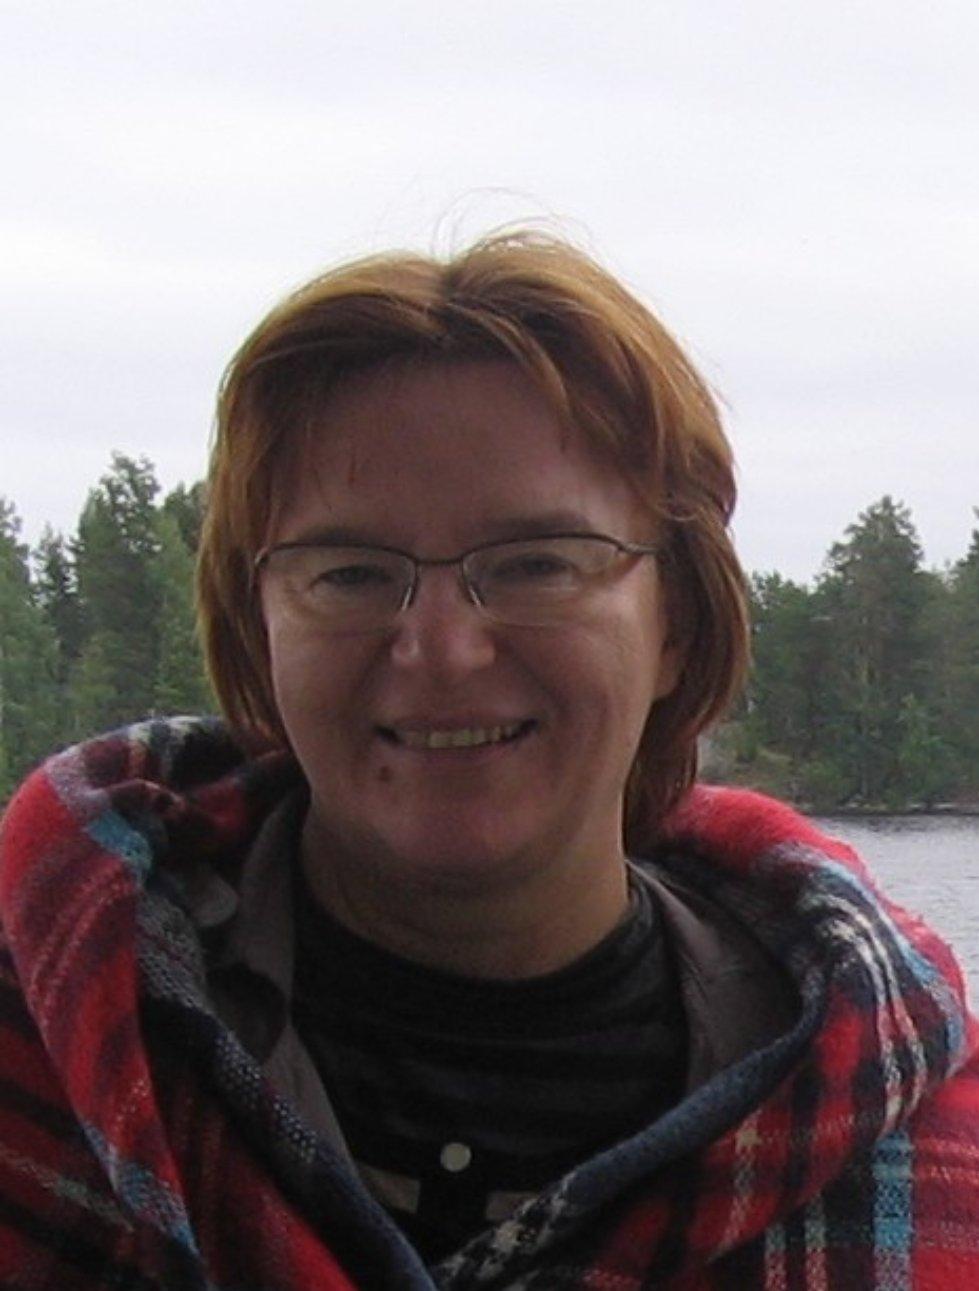 Невзорова Ольга Авенировна